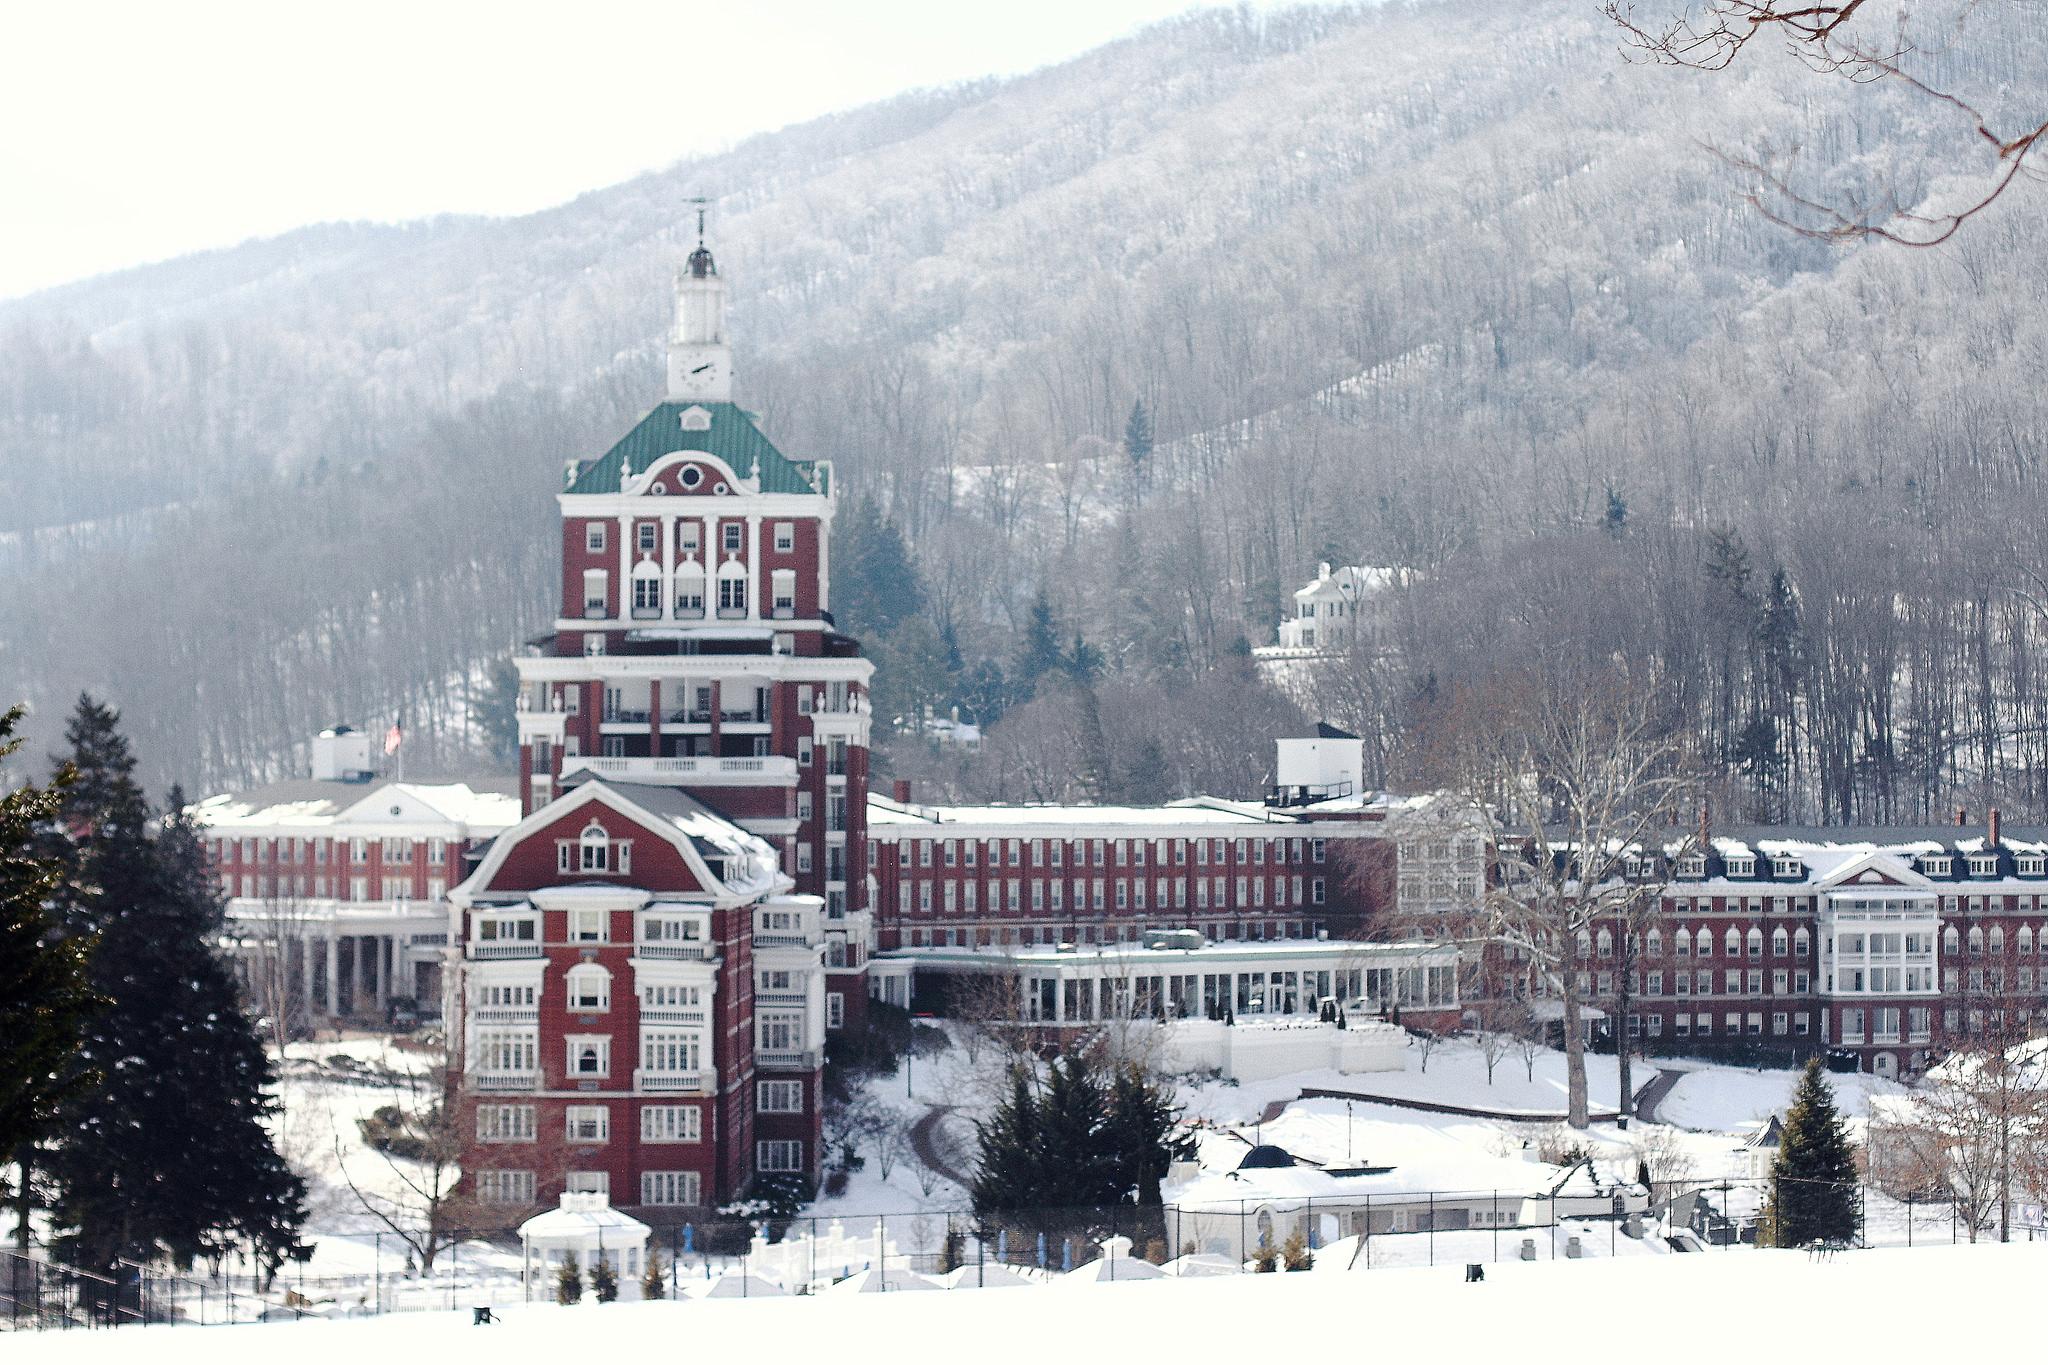 The Homestead, Virginia